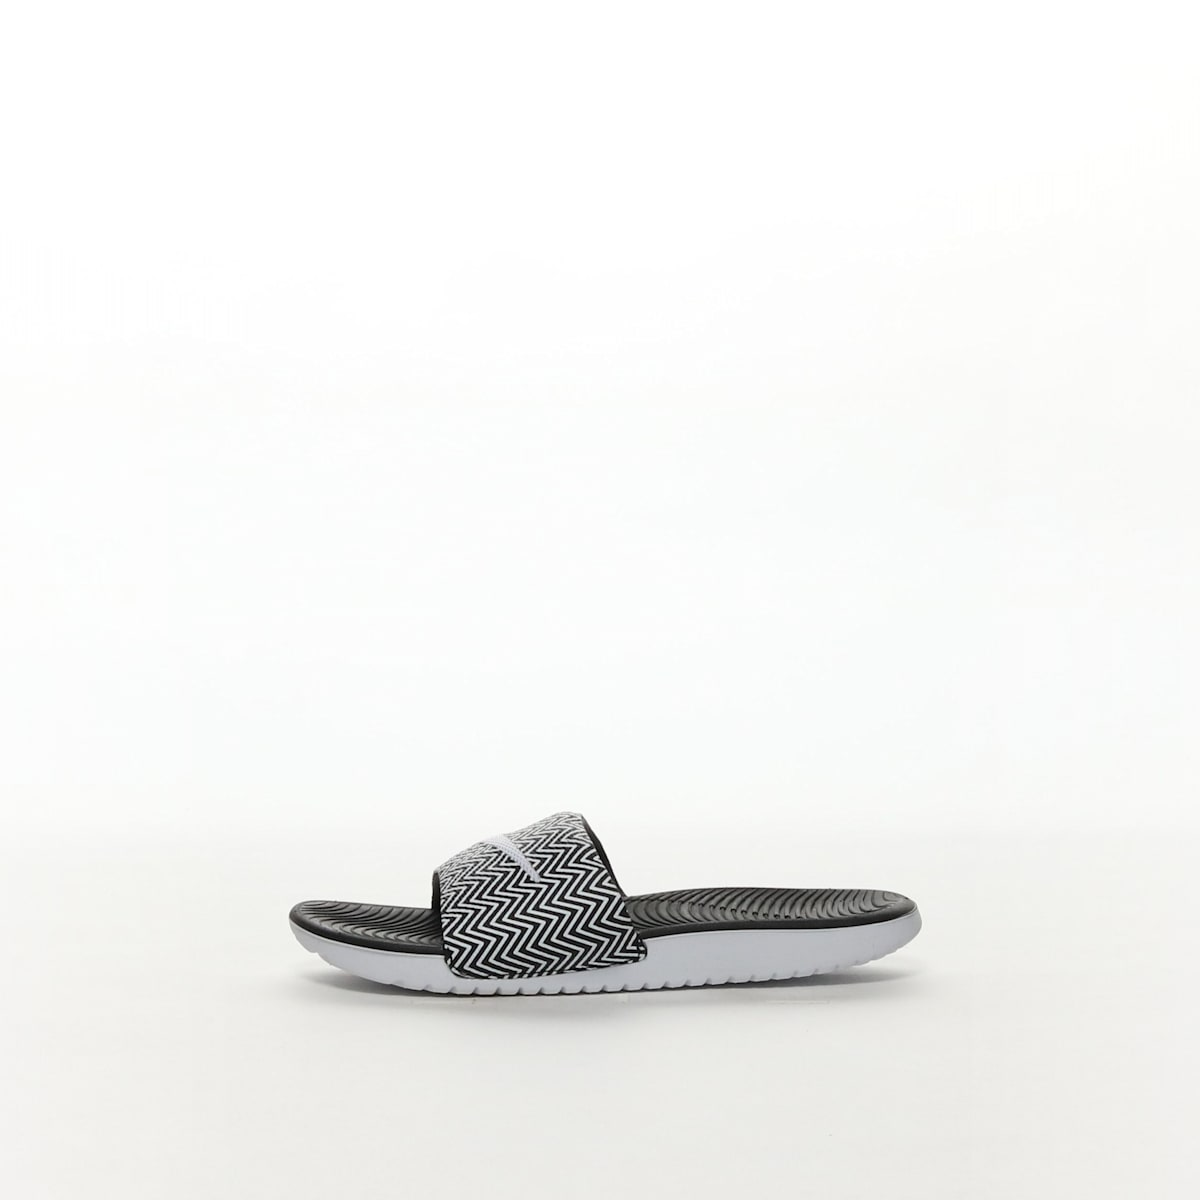 d365334f6 Women s Nike Kawa Slide Print Sandal - BLACK WHITE – Resku